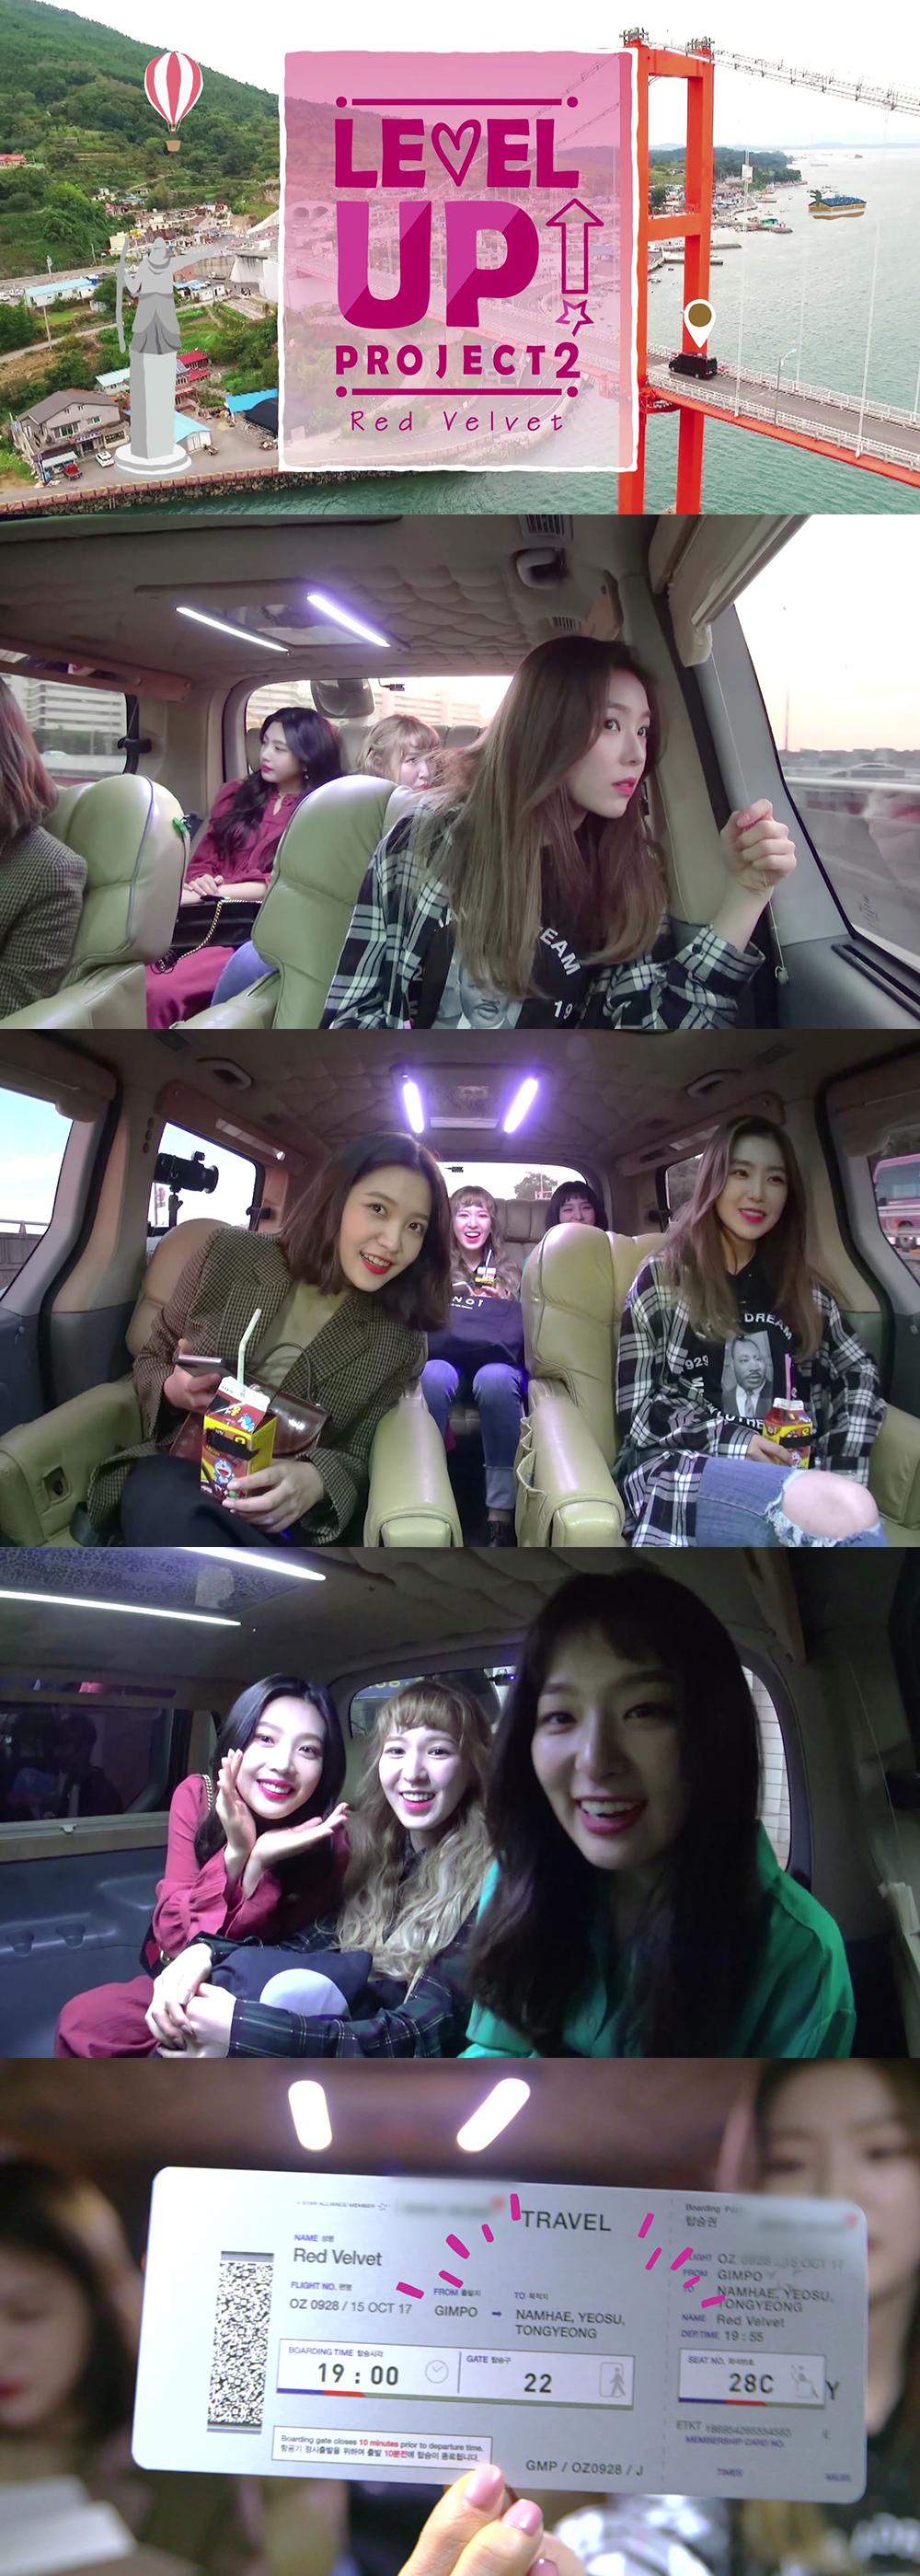 Red Velvet真人秀LEVEL UP PROJECT第二季旅行地揭开面纱